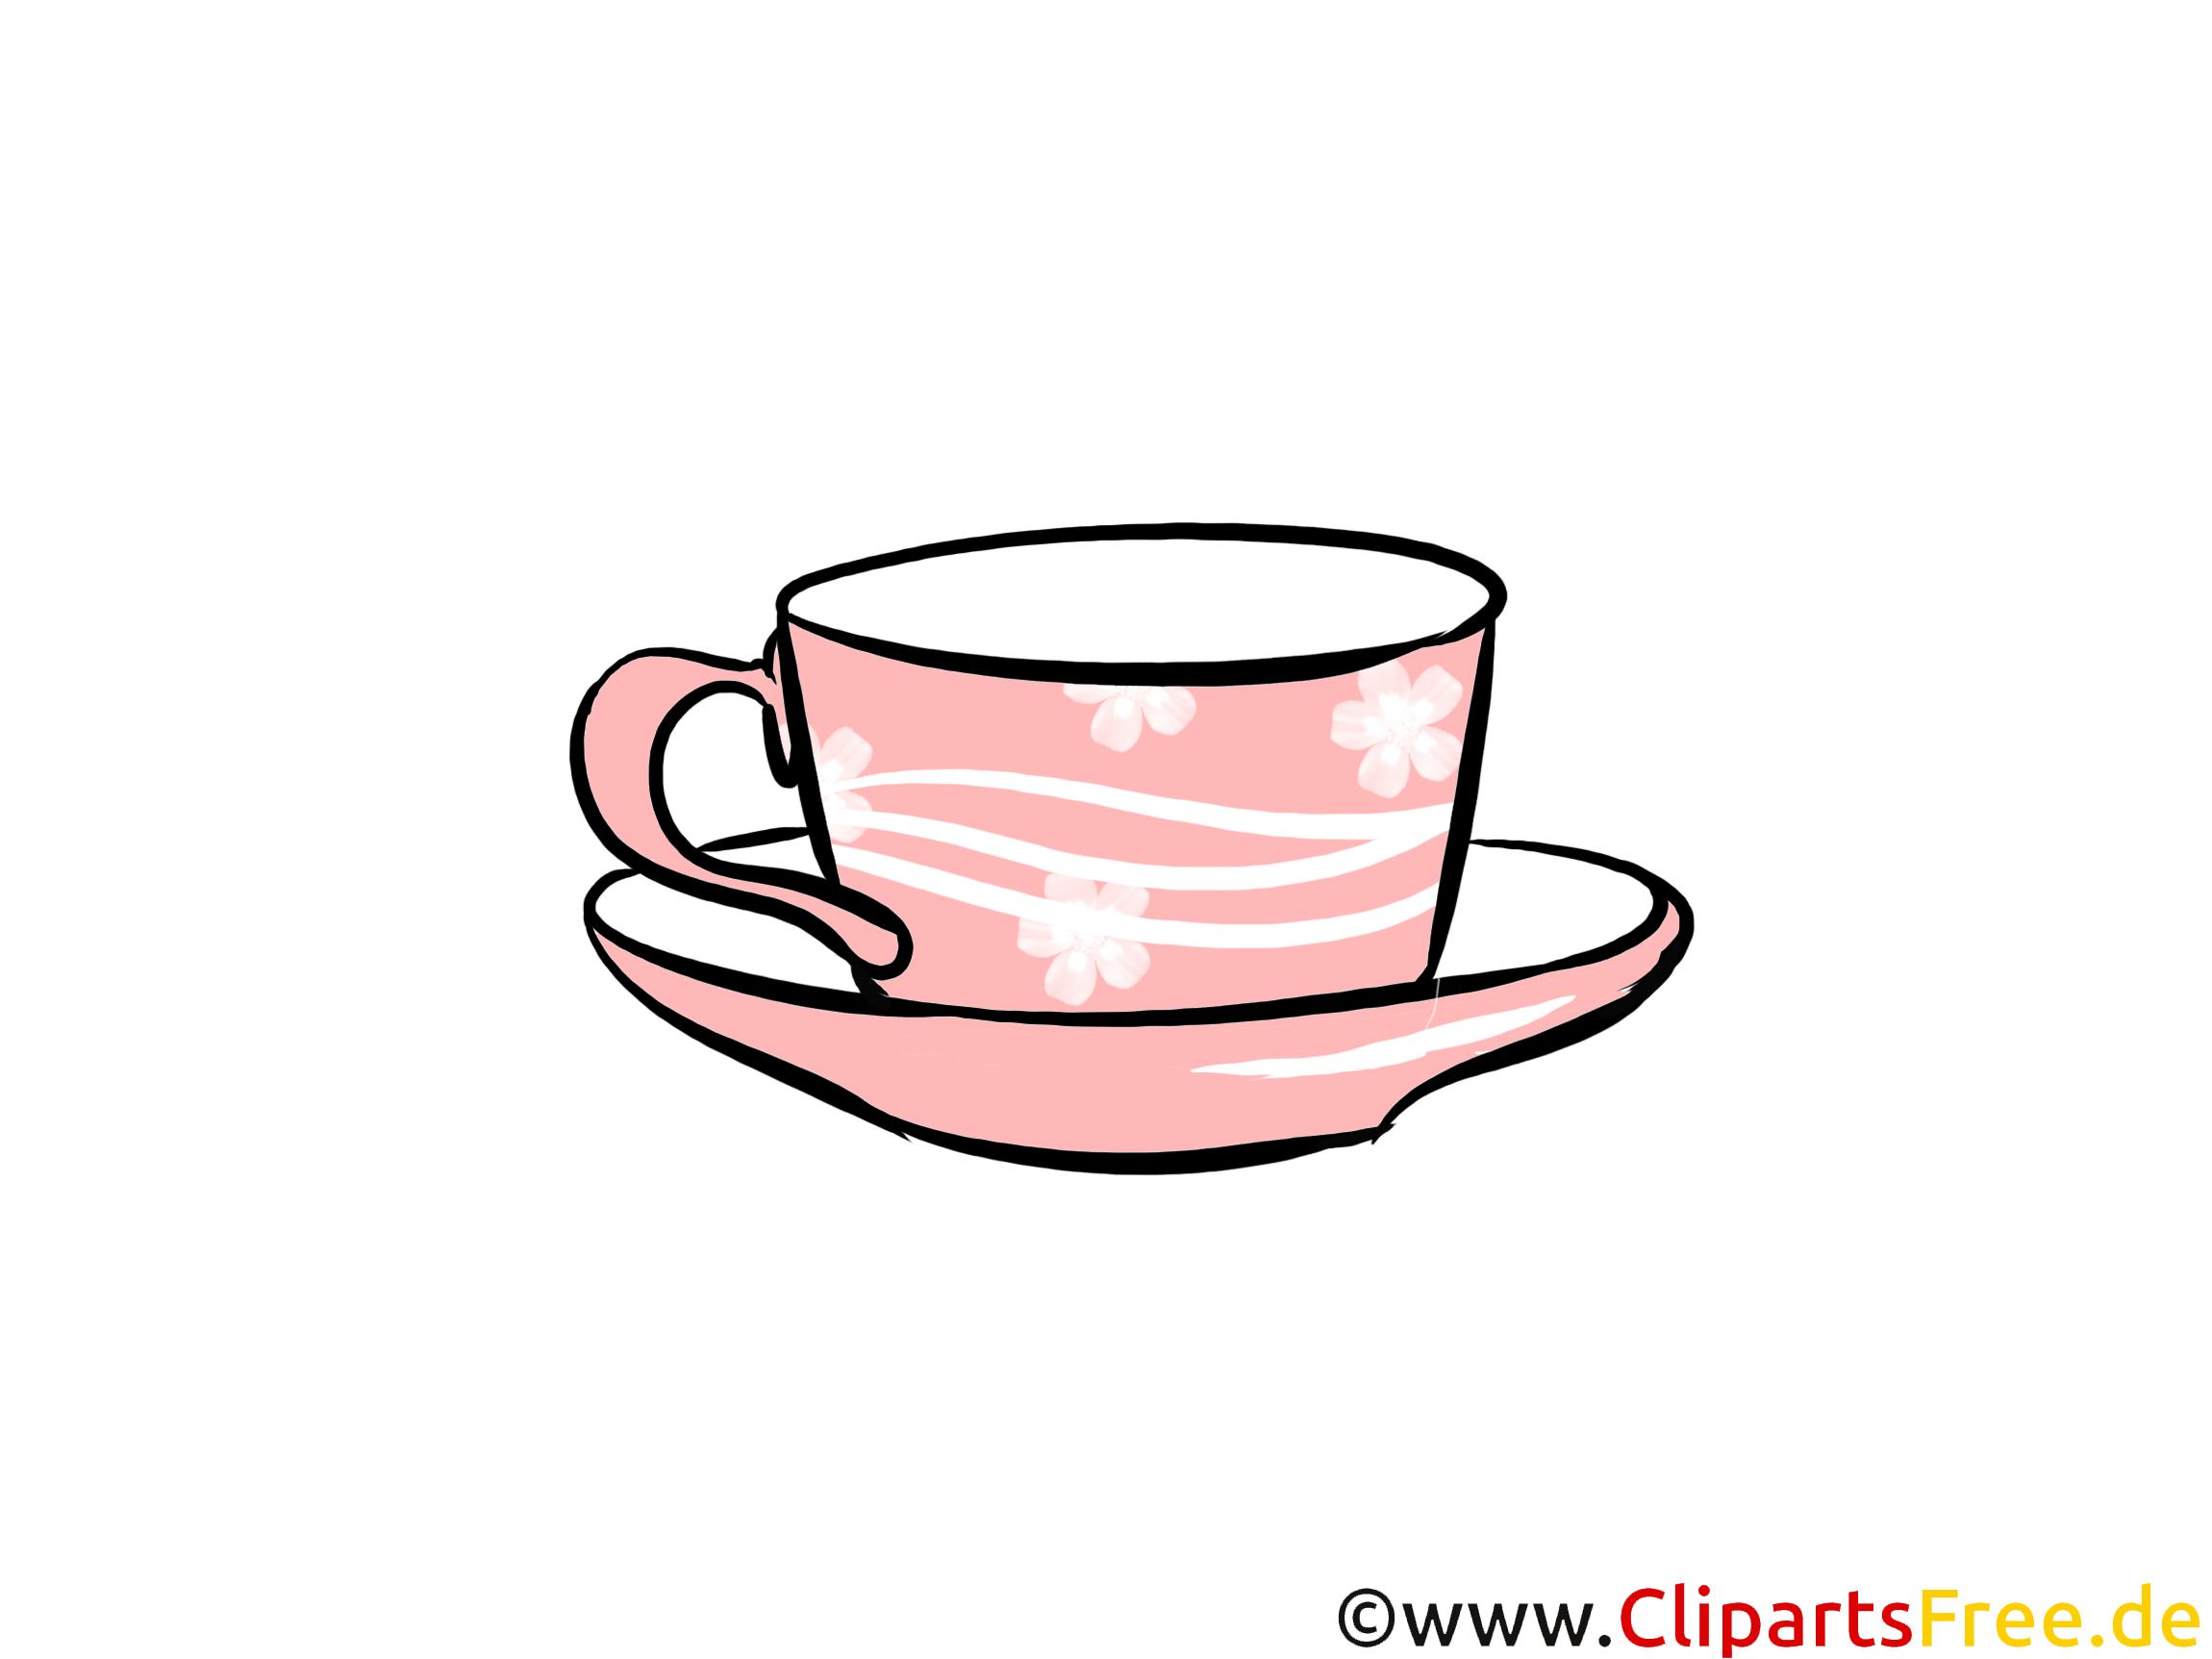 tasse mit unterteller illustration clipart bild. Black Bedroom Furniture Sets. Home Design Ideas